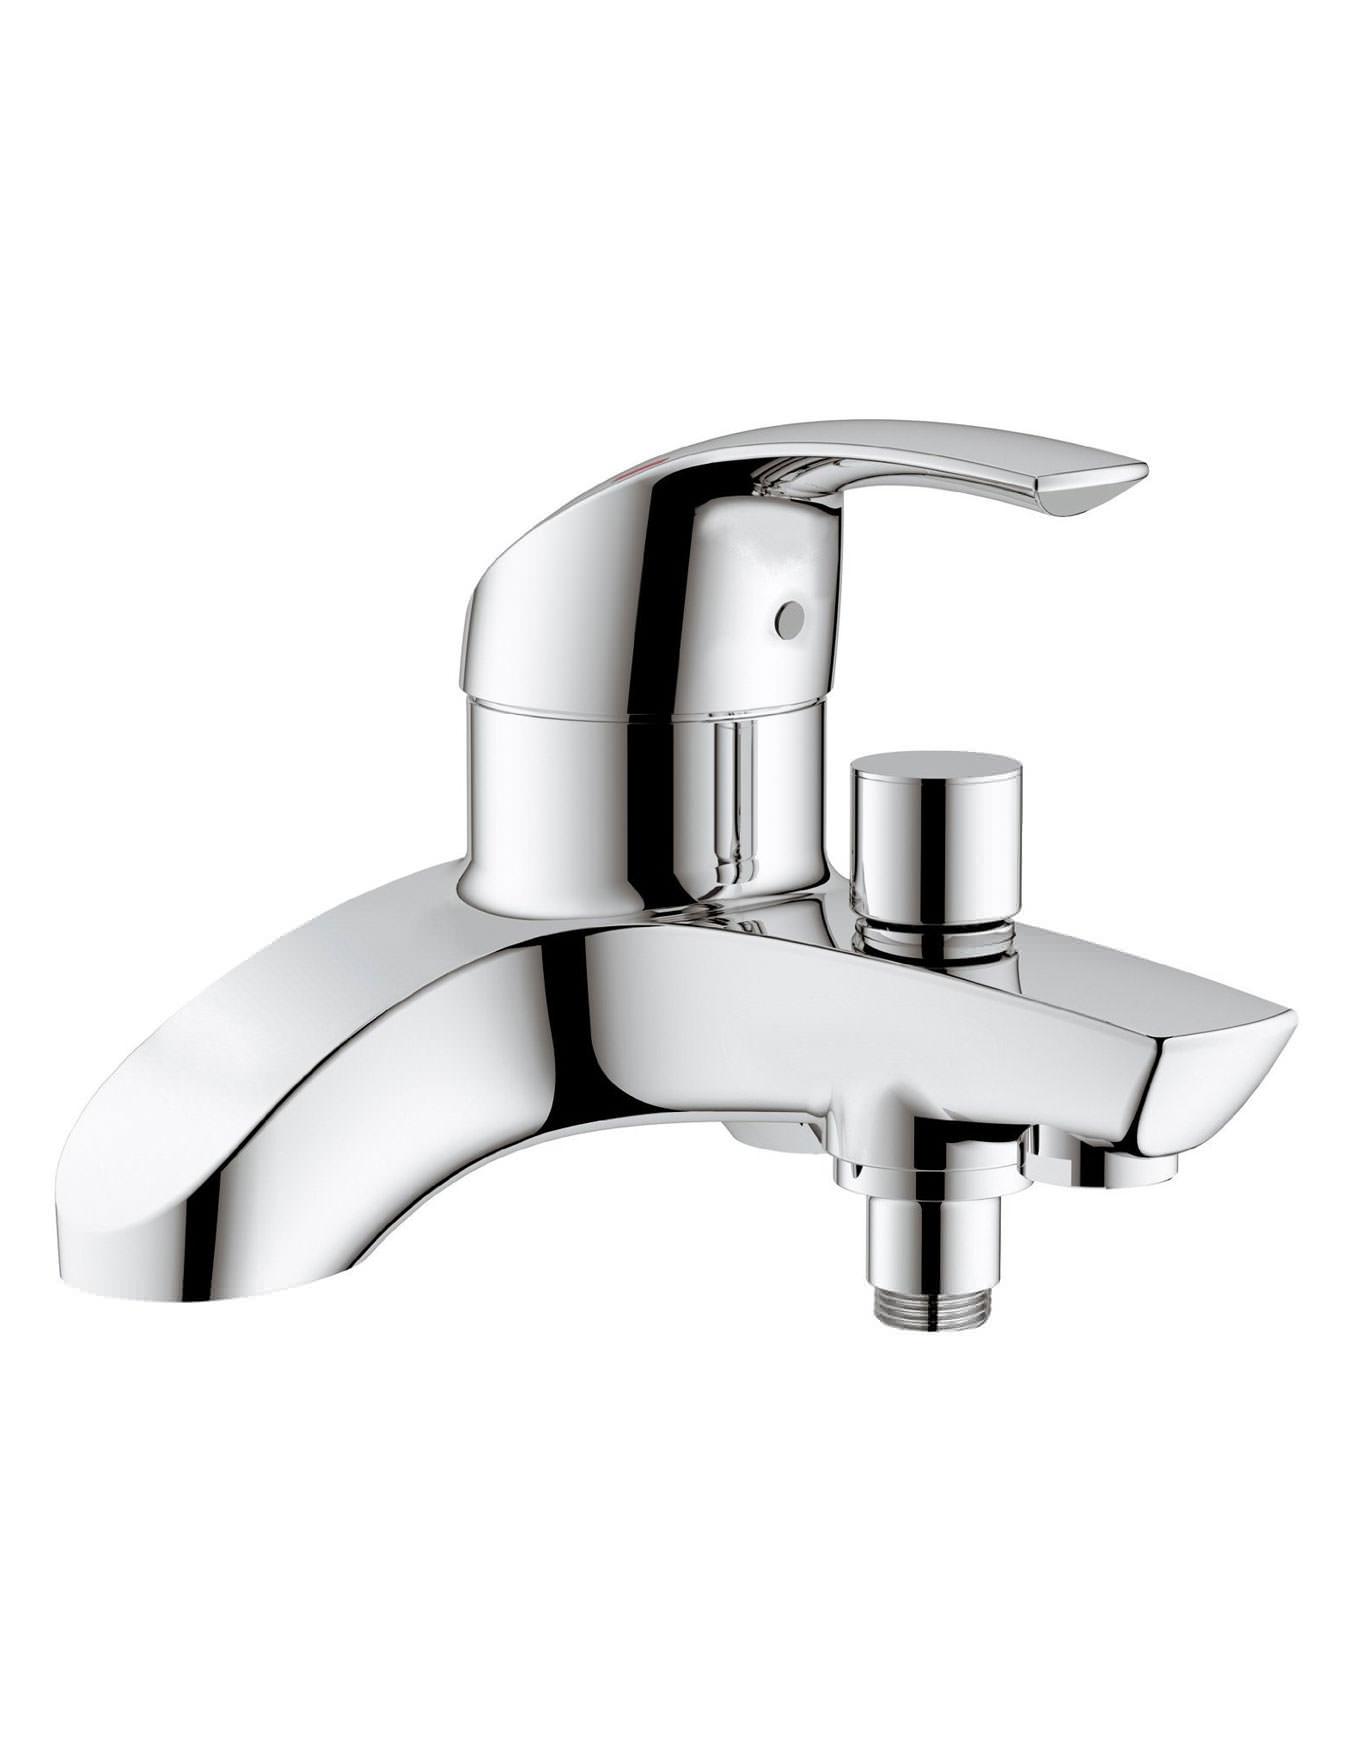 grohe eurosmart single lever deck mounted bath shower mixer tap. Black Bedroom Furniture Sets. Home Design Ideas